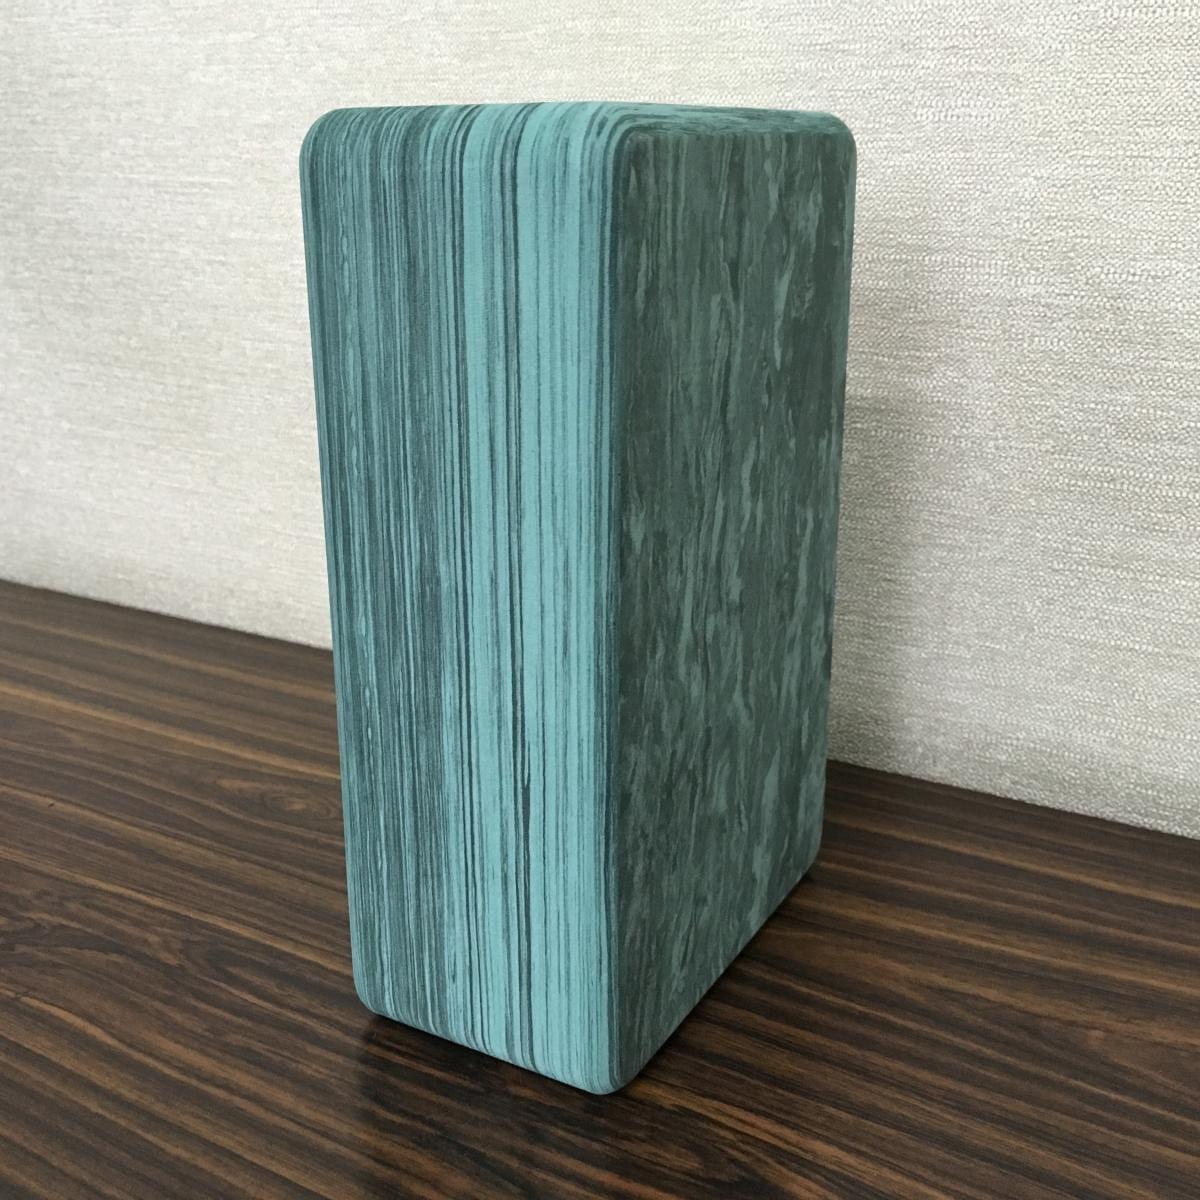 【QMAT】 40D瑜珈磚 混色系-青銅石紋、黑白雲彩 5